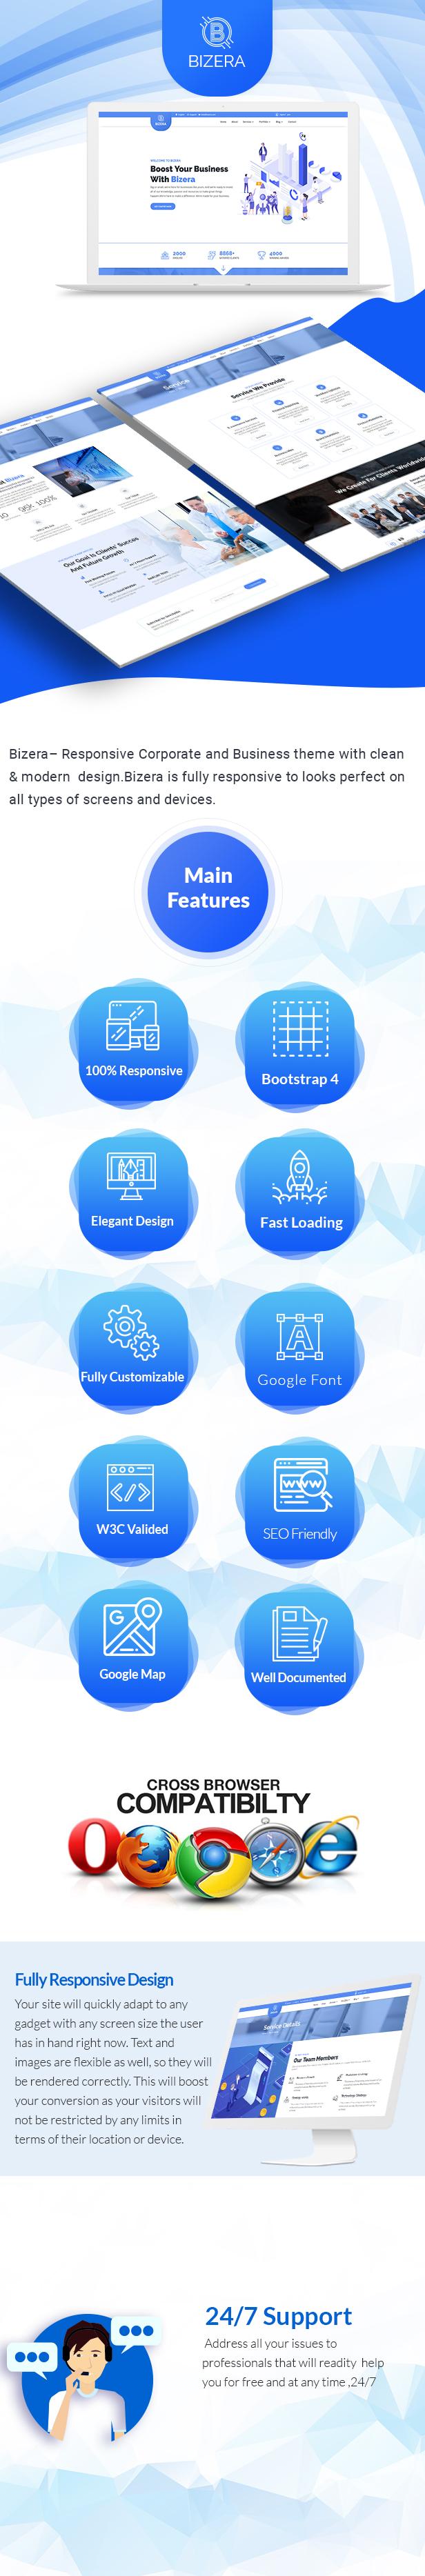 Bizera – Corporate and Business Landing Template - 1